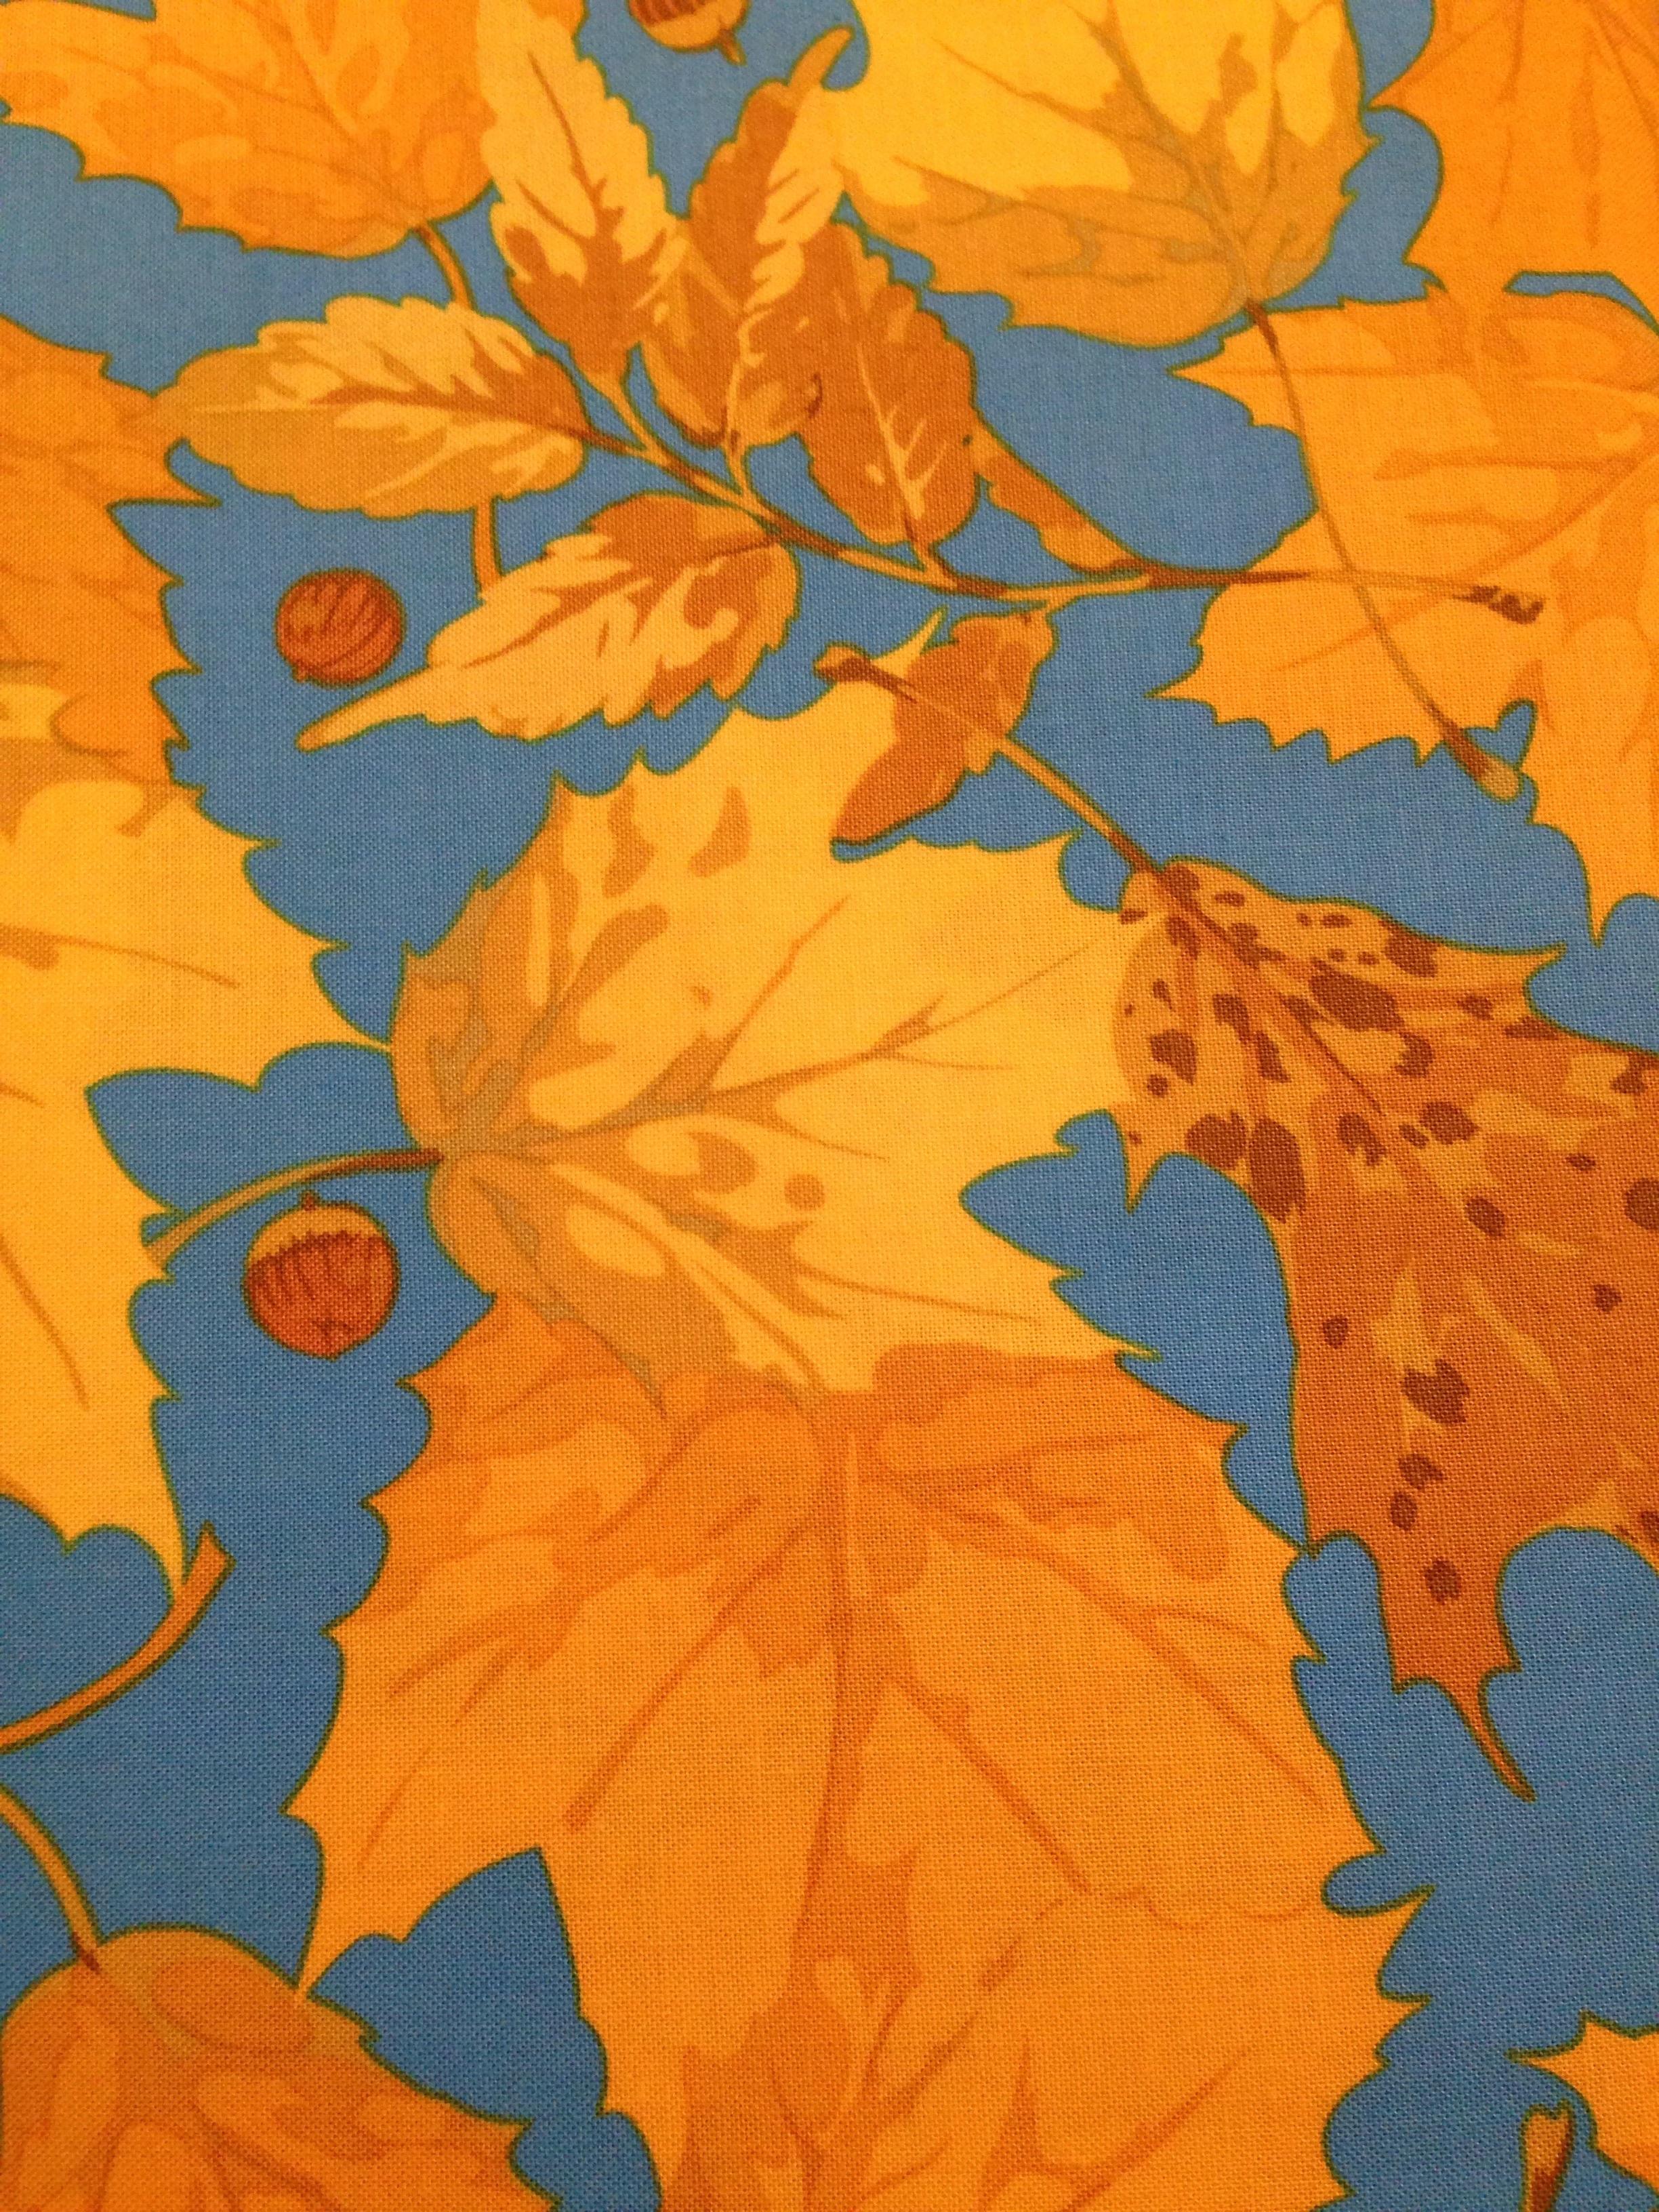 A fall print by Martha Negley